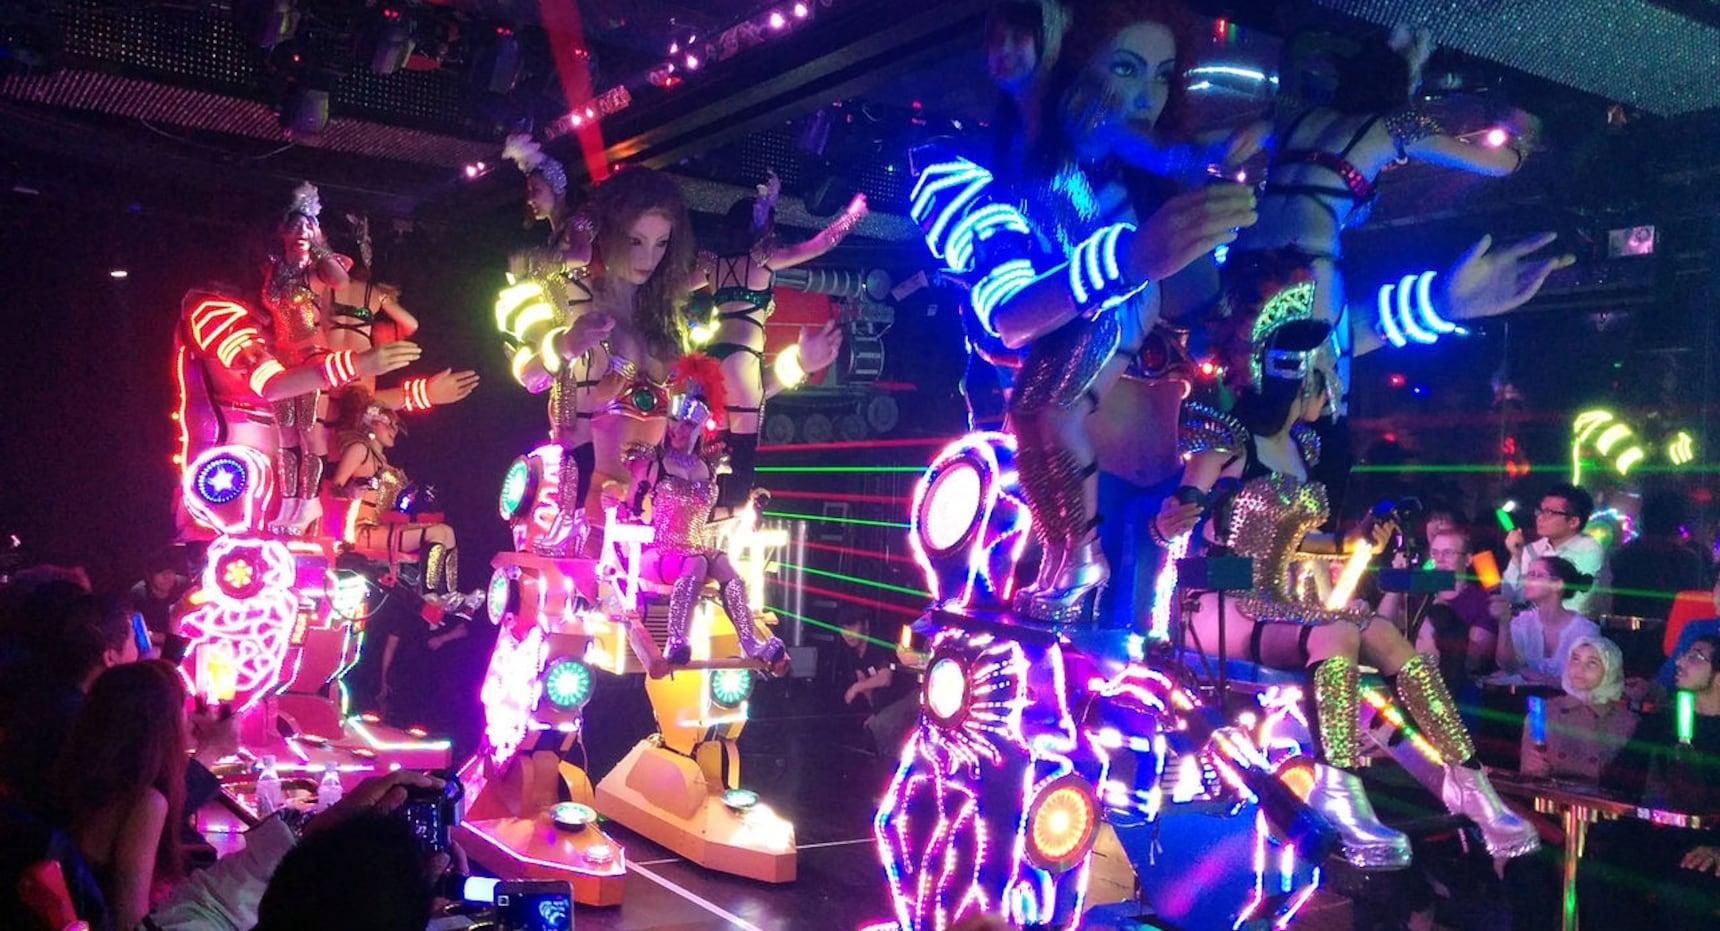 Robot Restaurant Serving up Epic Entertainment